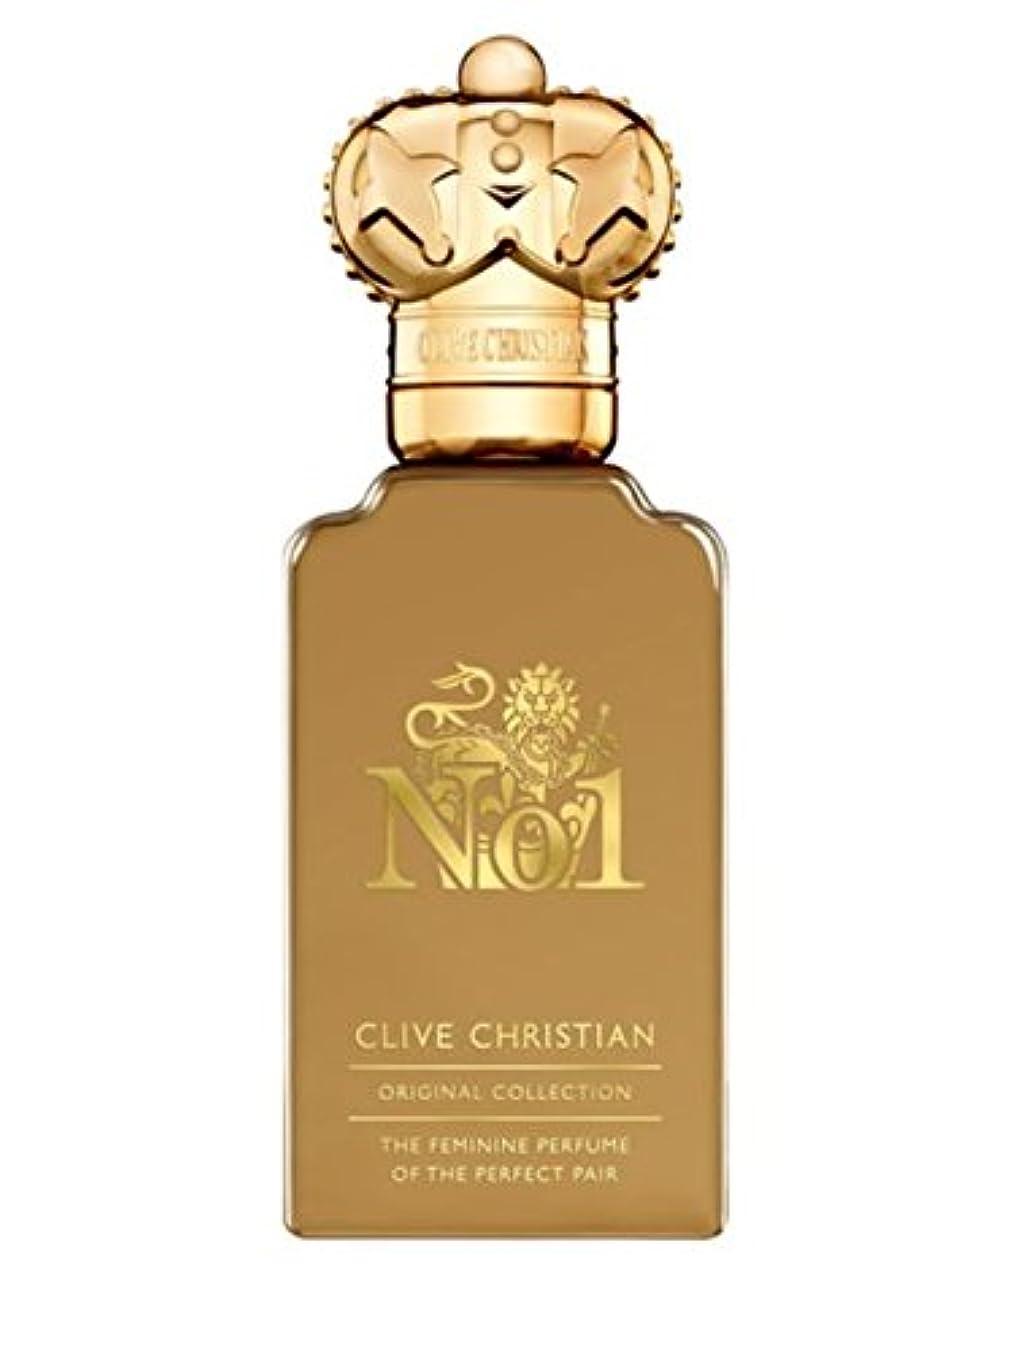 Clive Christian No 1 (クライブ クリスチャン ナンバーワン) 1.6 oz (48ml) Perfume Spray for Women